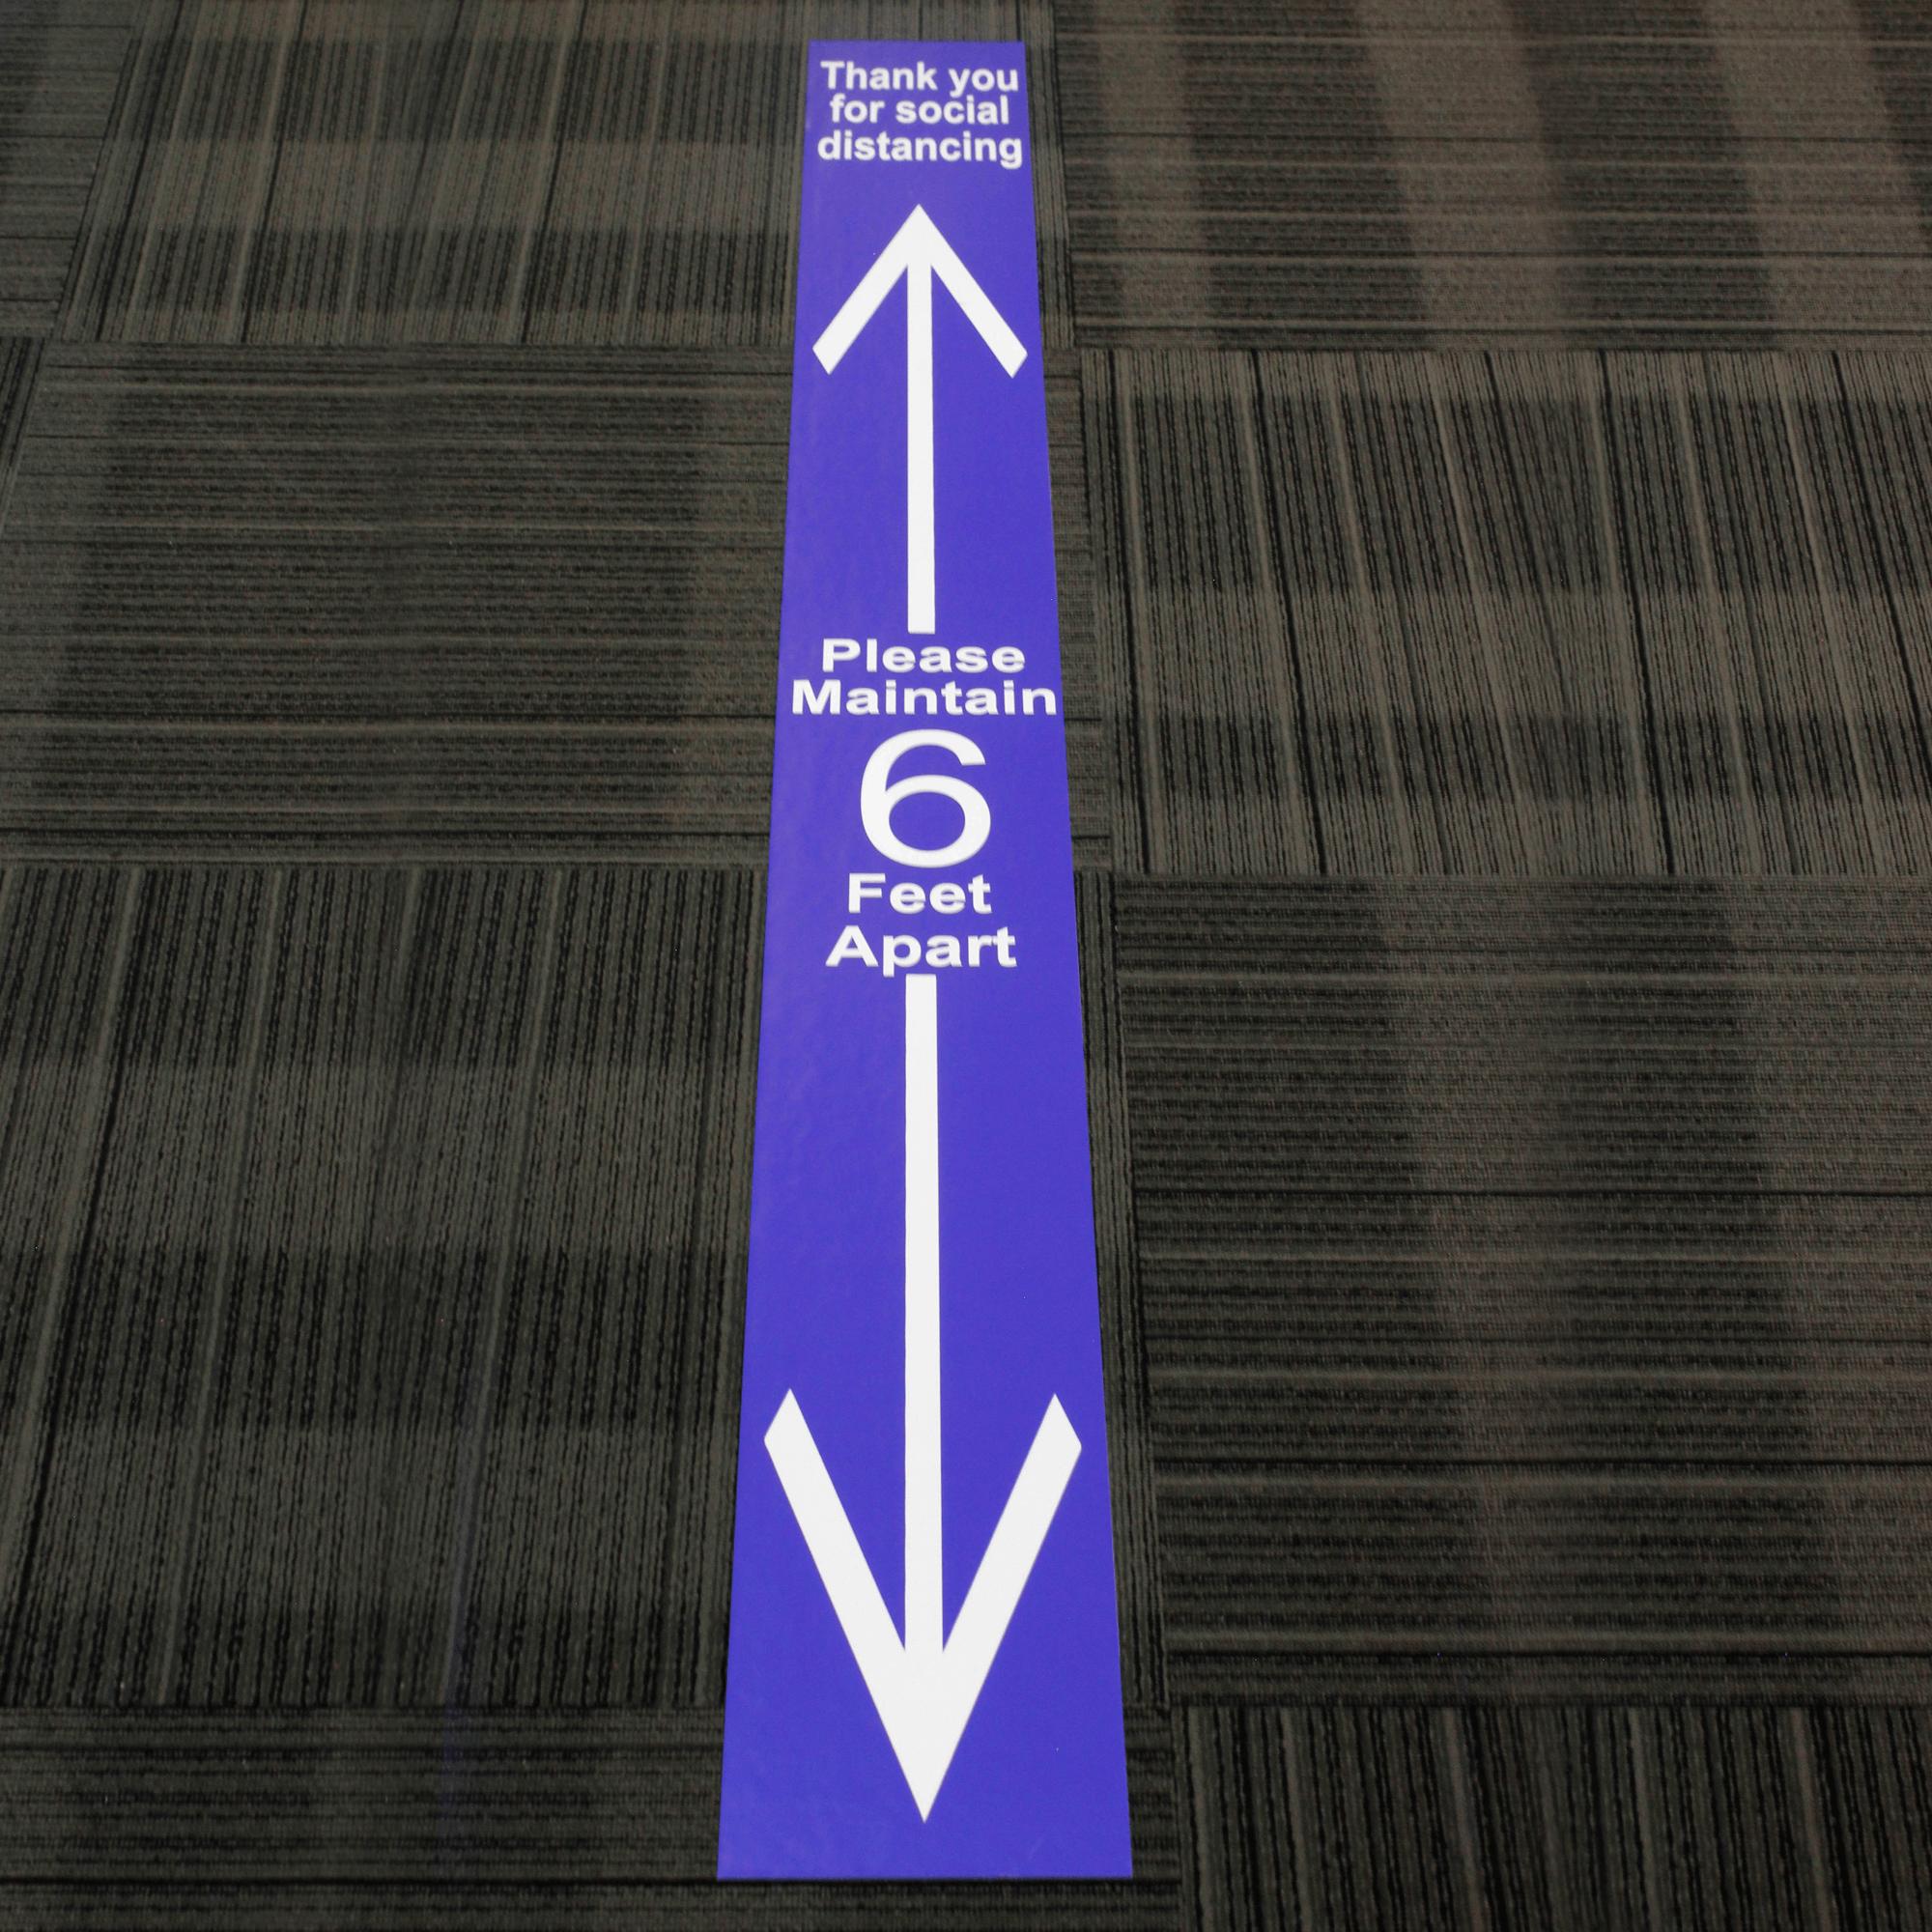 Please Maintain 6 Ft Apart Floor Decal